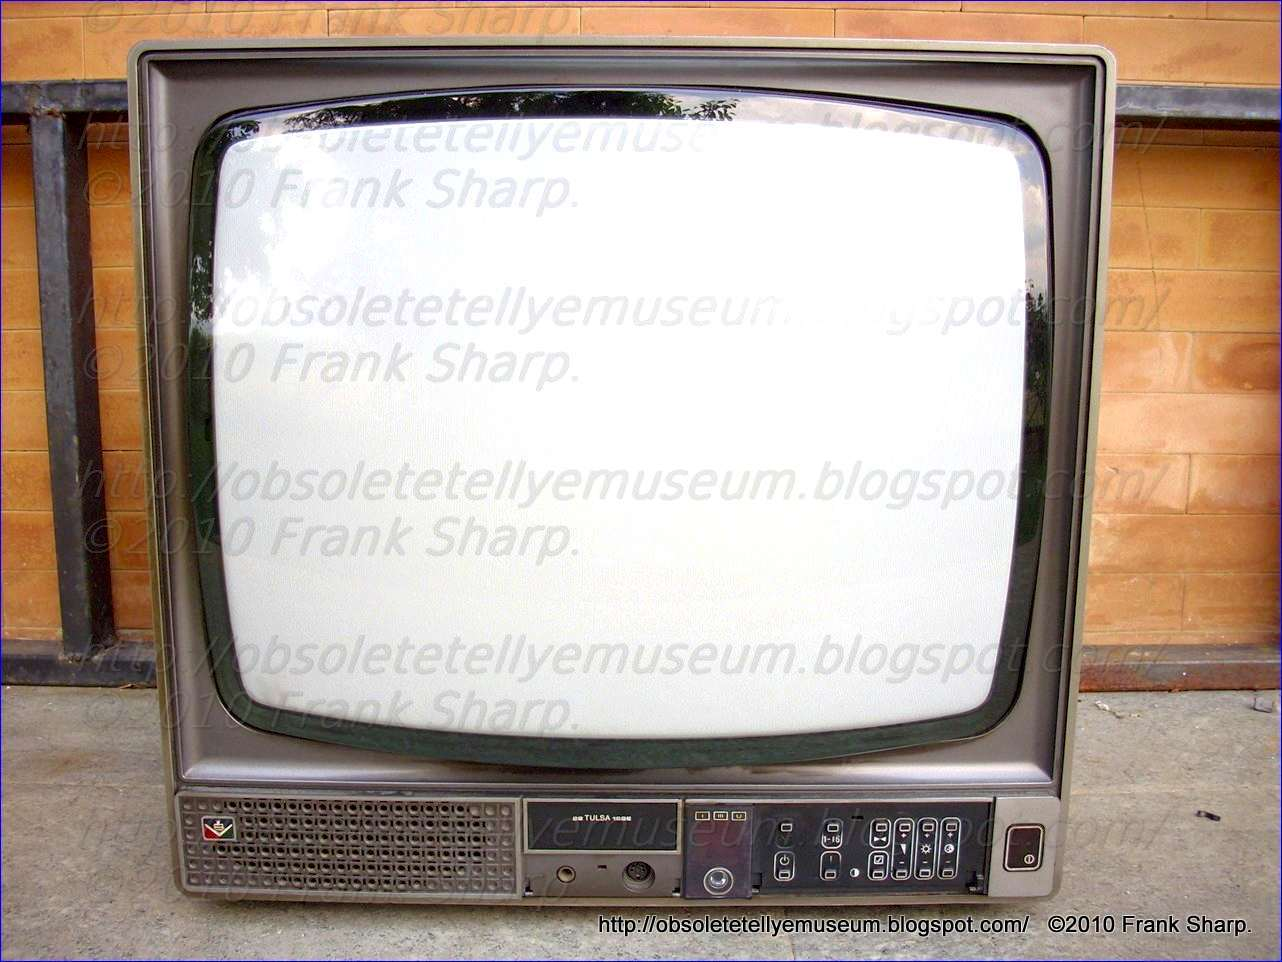 Obsolete Technology Tellye !: DUMONT (EMERSON) 22 TULSA 16 SE YEAR 1977.